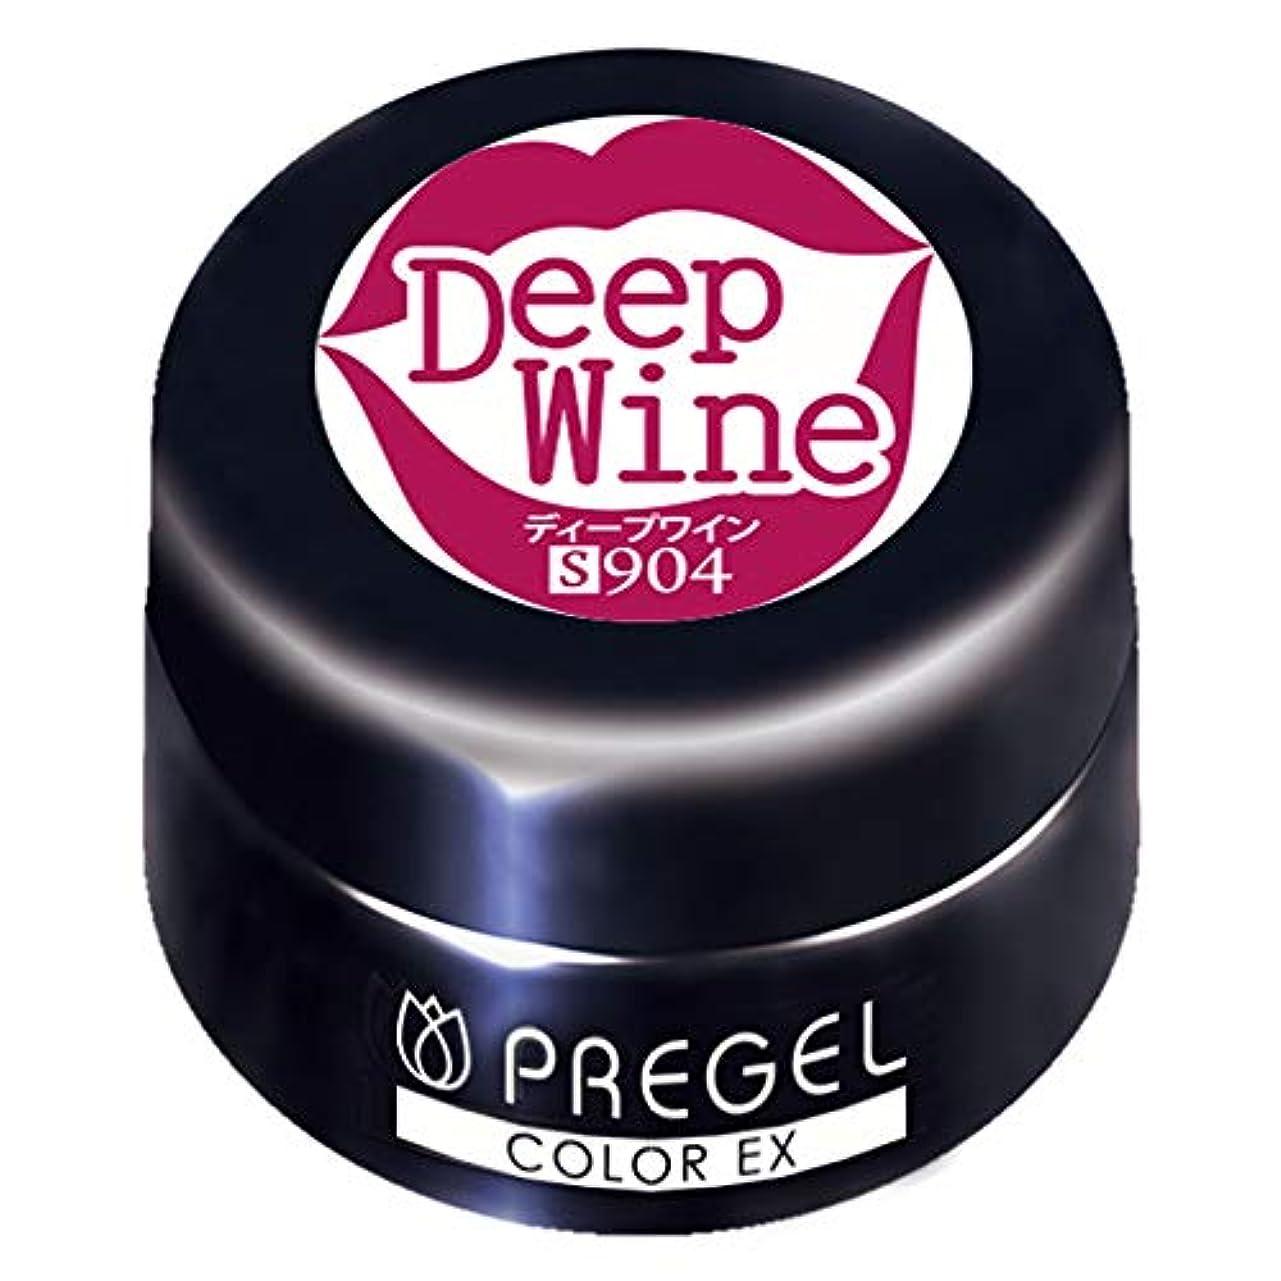 PRE GEL カラーEX ディープワイン 3g PG-CE904